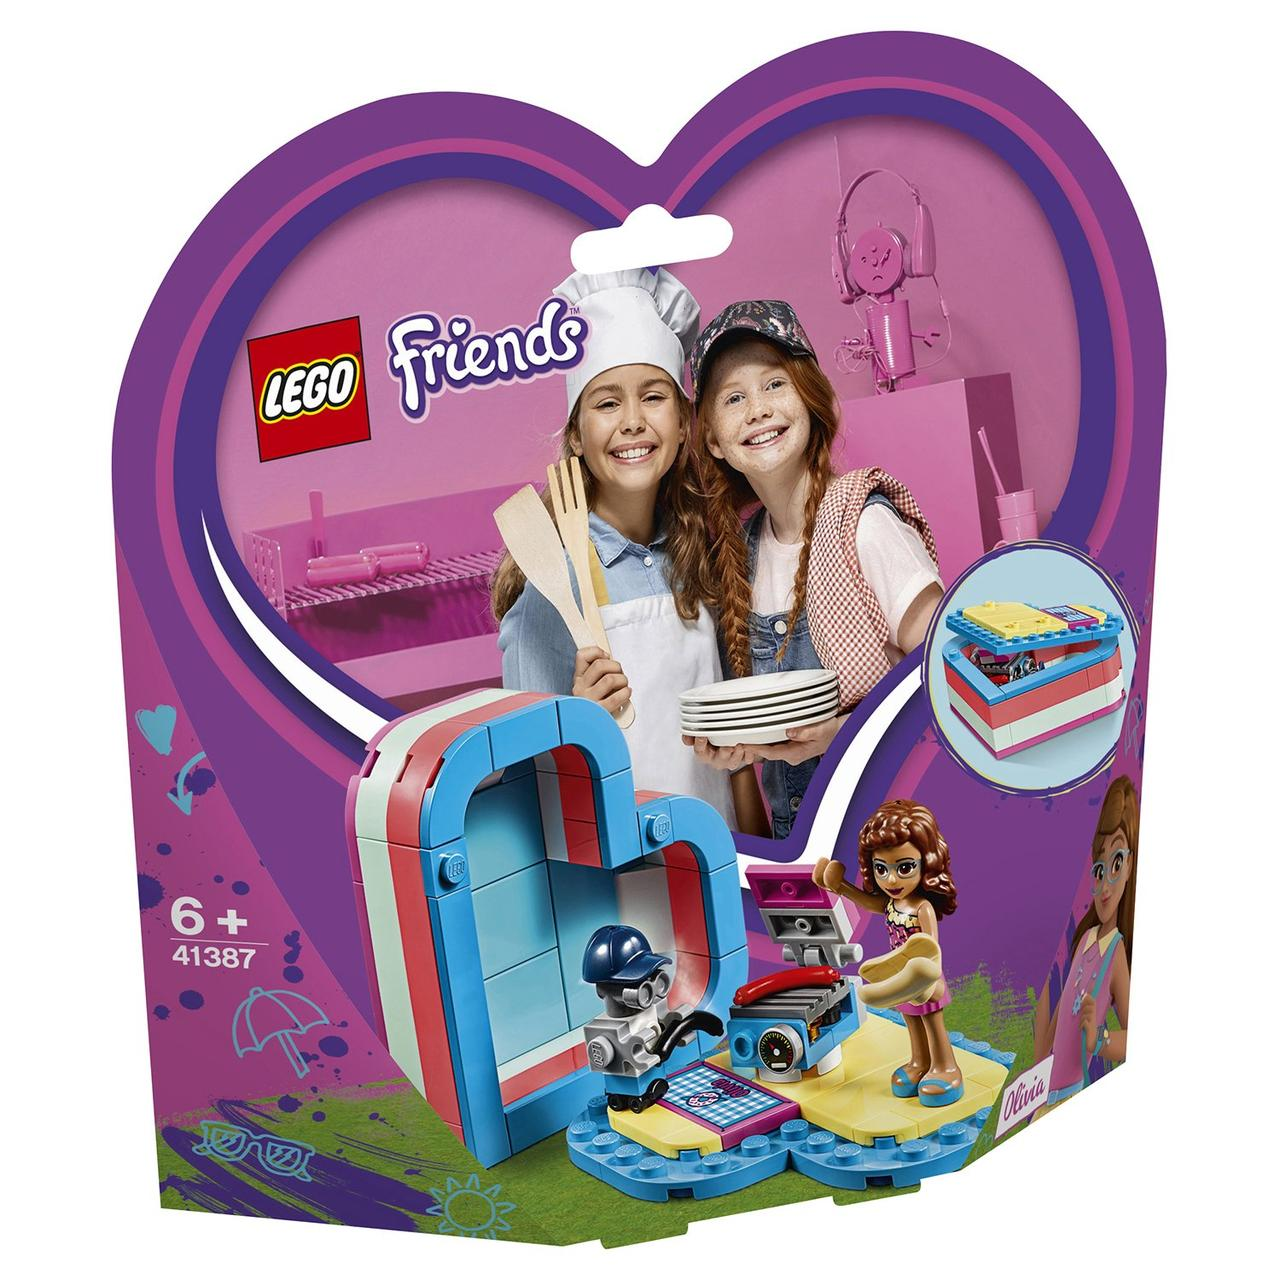 41387 Lego Friends Летняя шкатулка-сердечко для Оливии, Лего Подружки